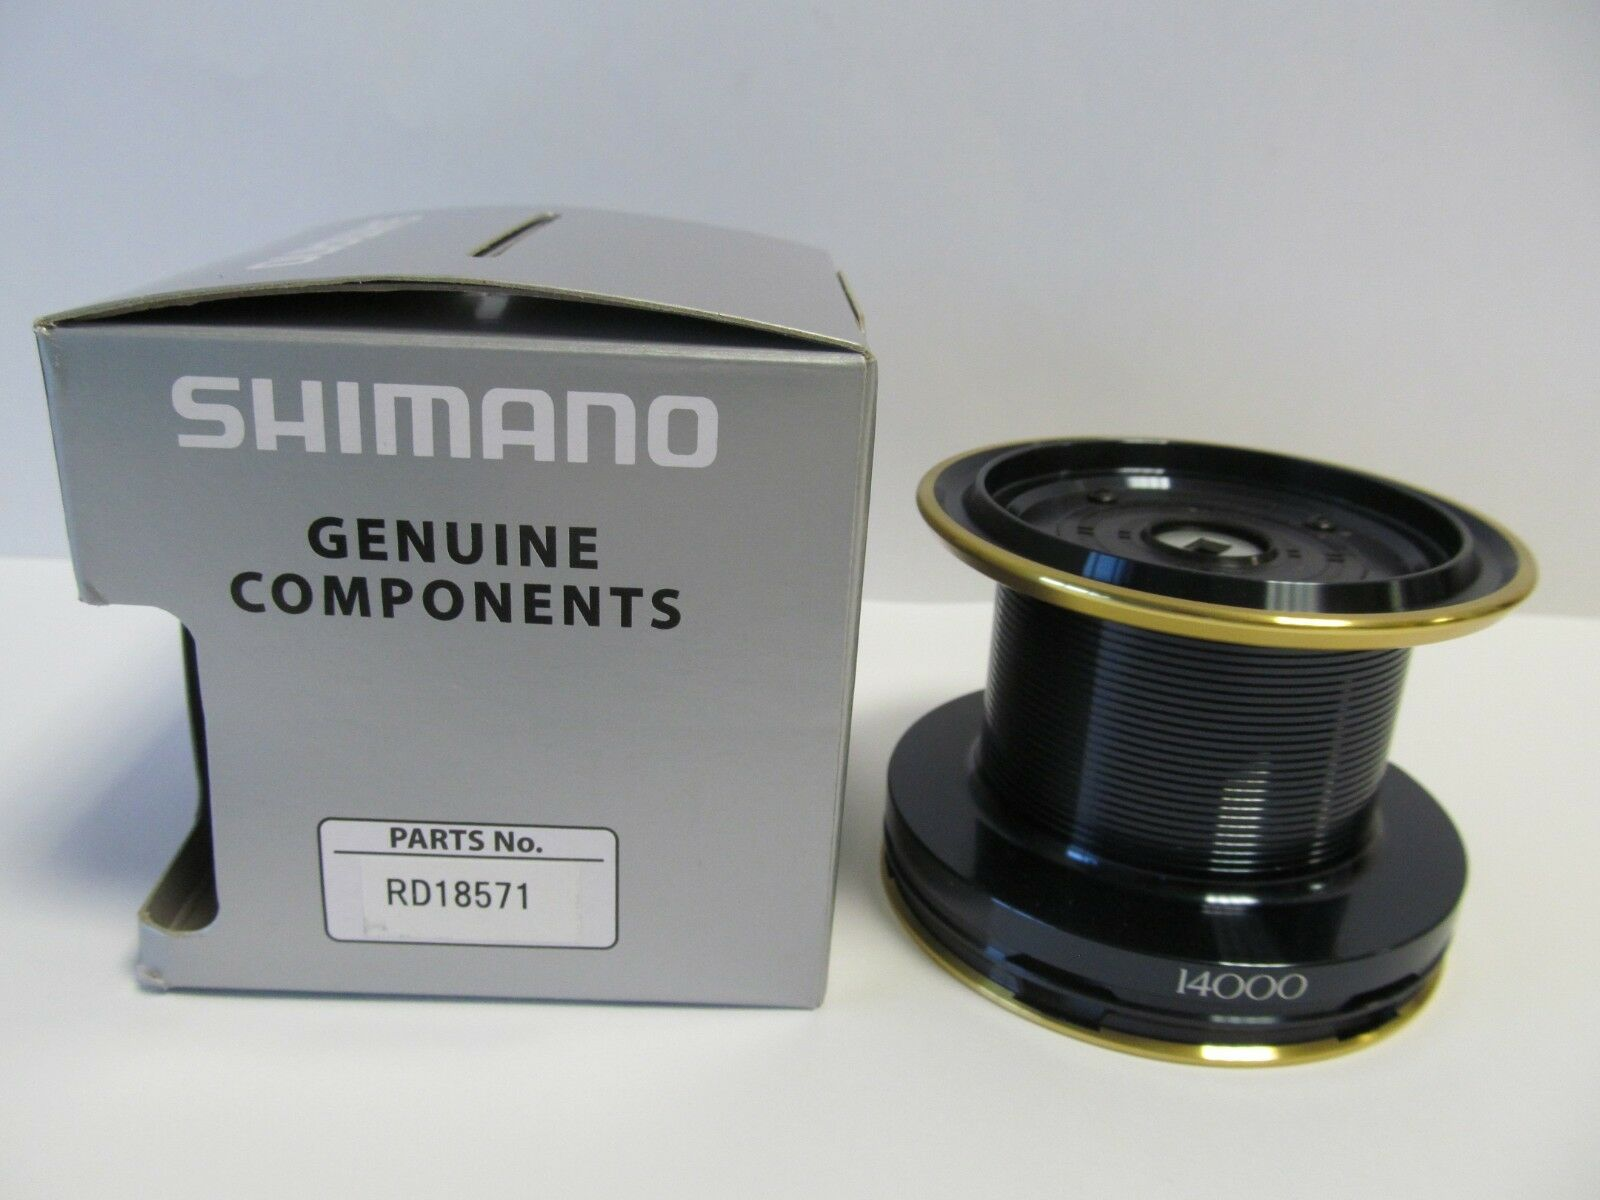 SHIMANO SPARE SPOOL TO FIT POWER AERO 14000 XSB NEW 2018 MODEL (RD 18571)